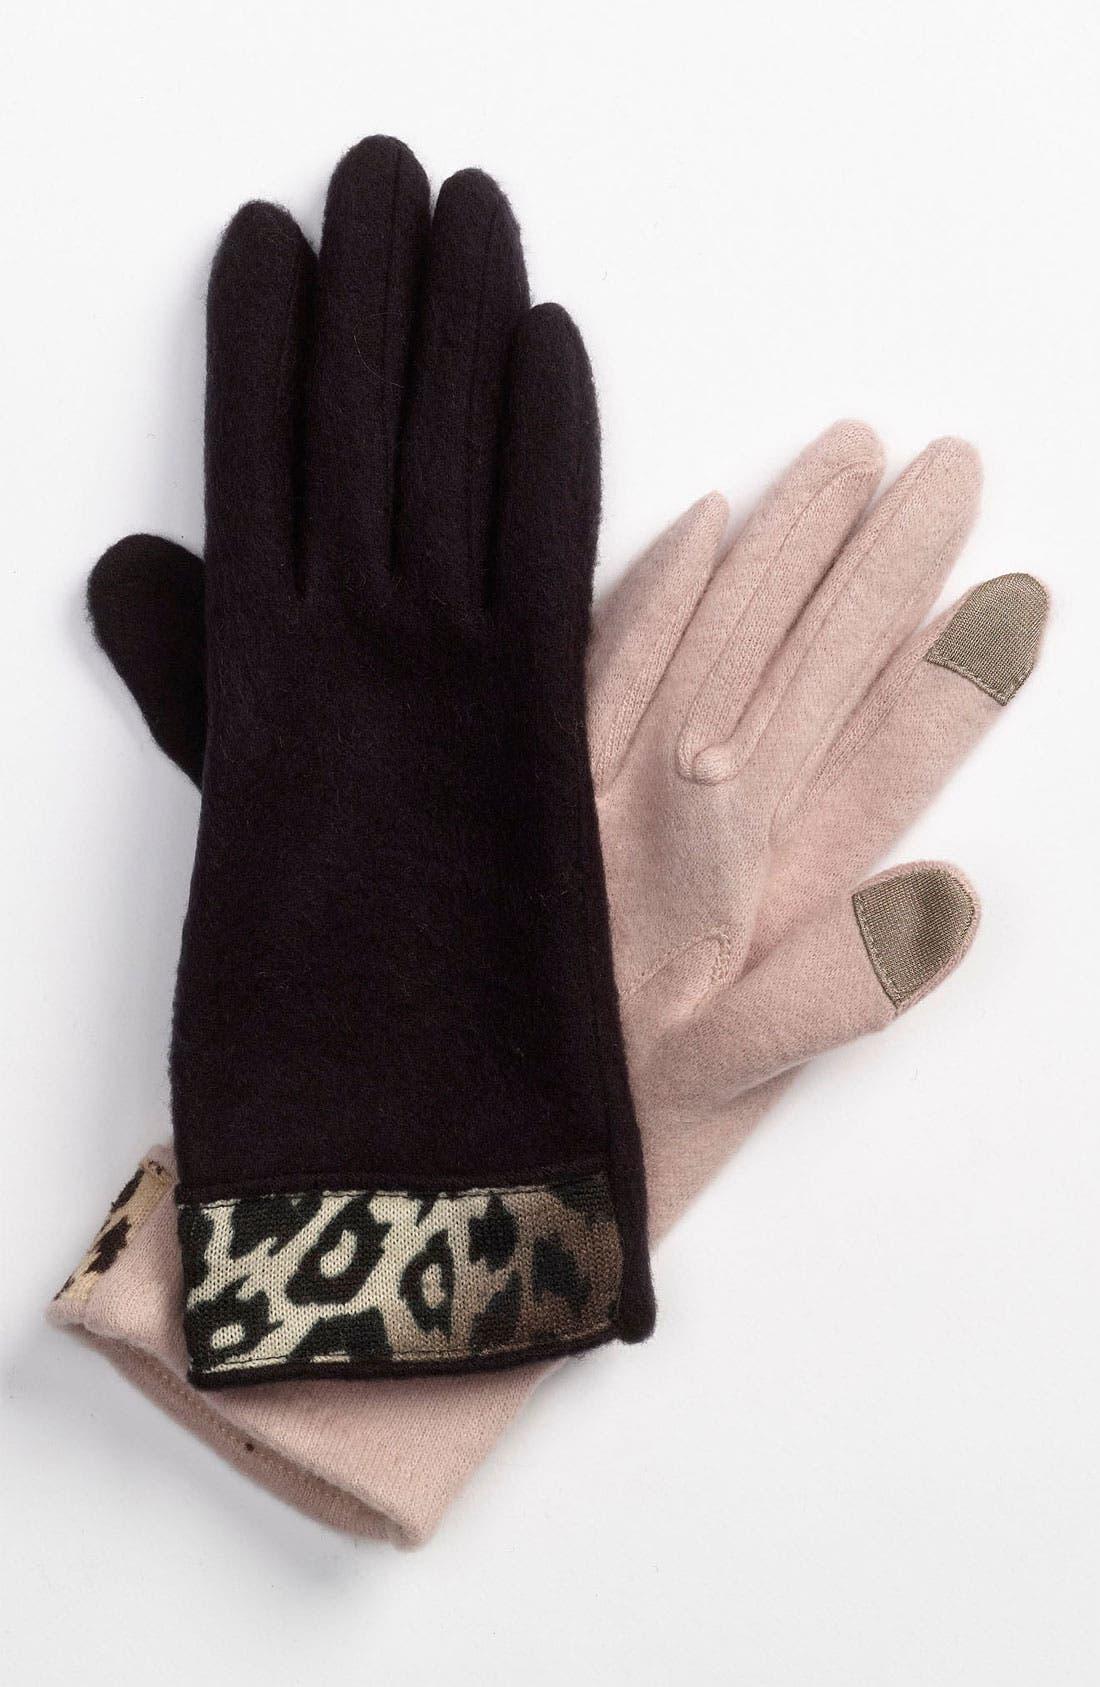 Alternate Image 1 Selected - Brazen 'Cheetah Cuff' Tech Gloves